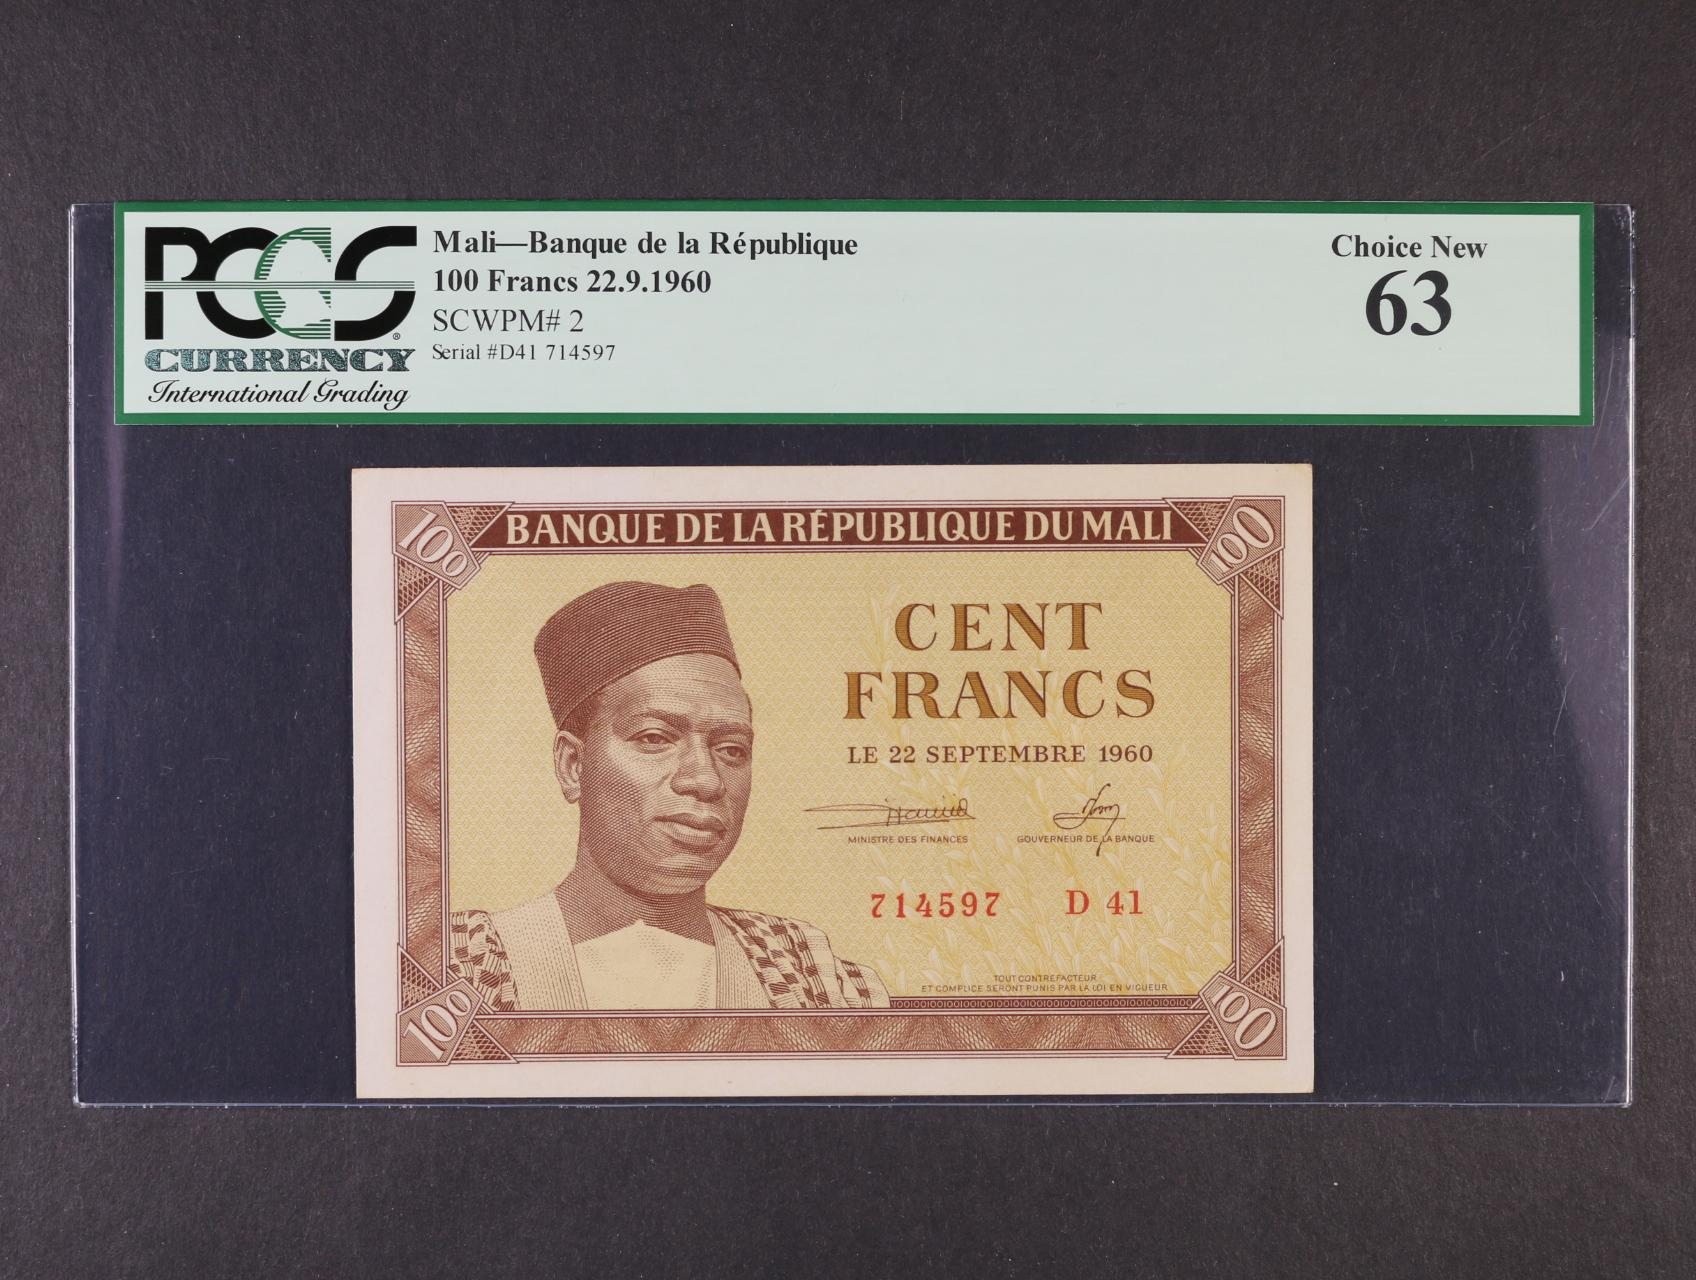 100 Francs 22.9.1960, Pi. 2, PCGS 63